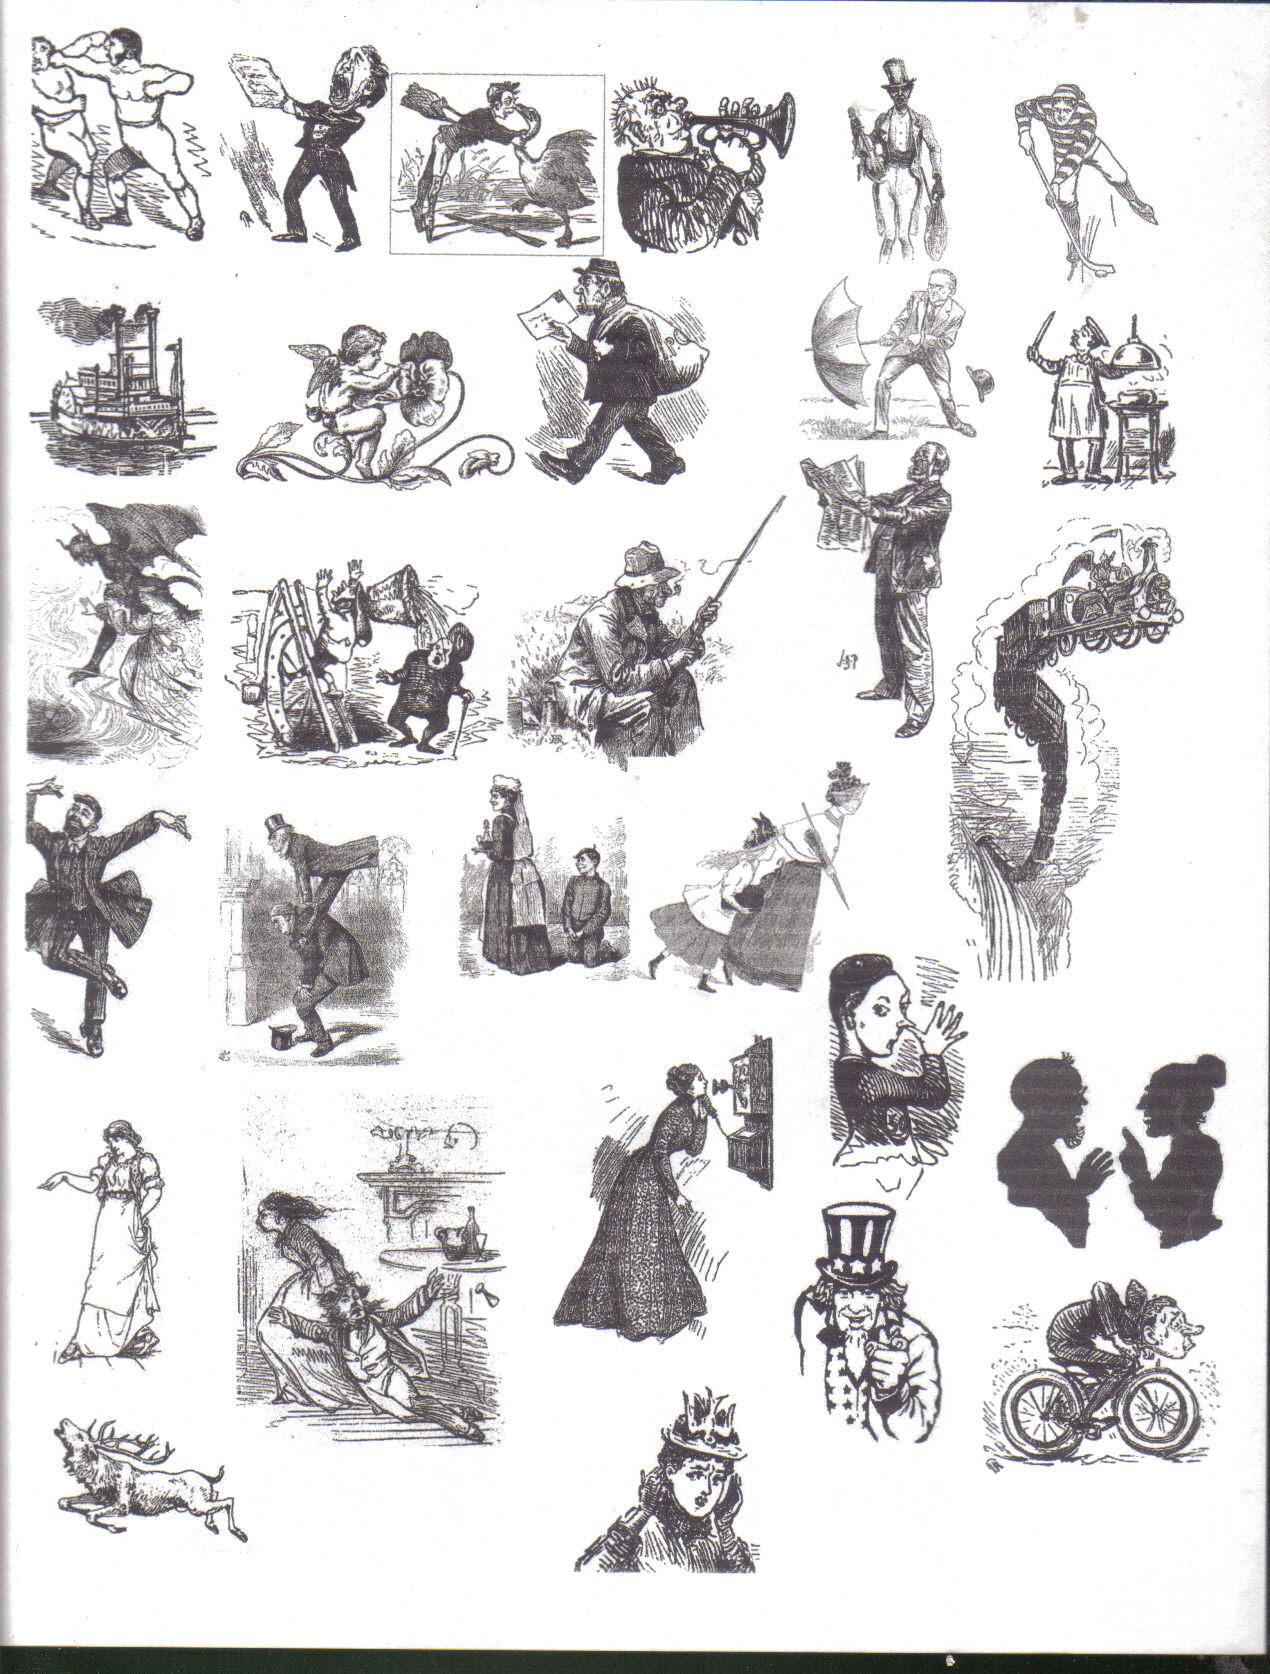 19th century clipart.